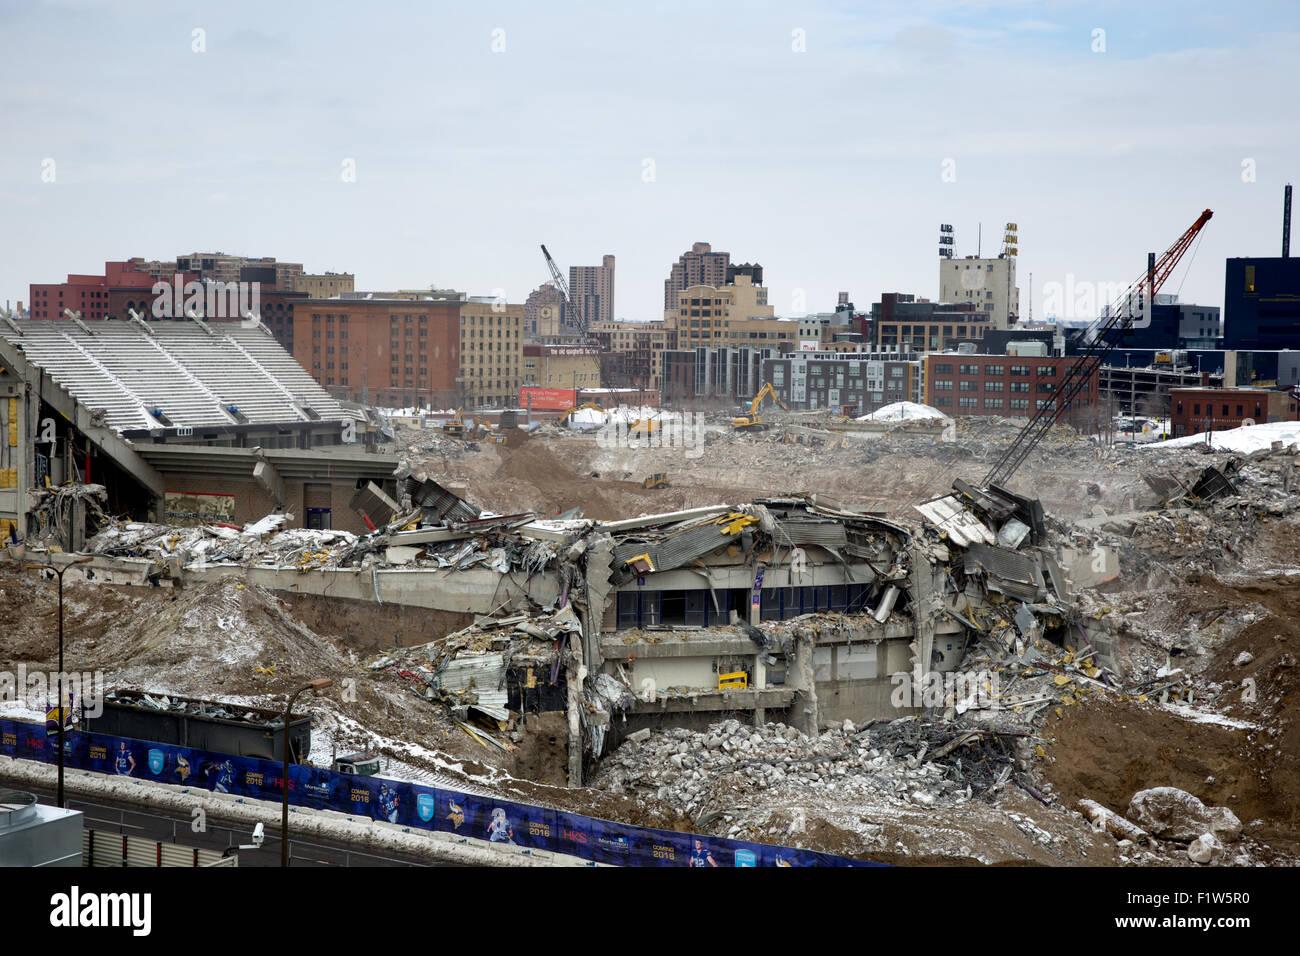 Demolition of the Hubert H. Humphrey Metrodome - Stock Image